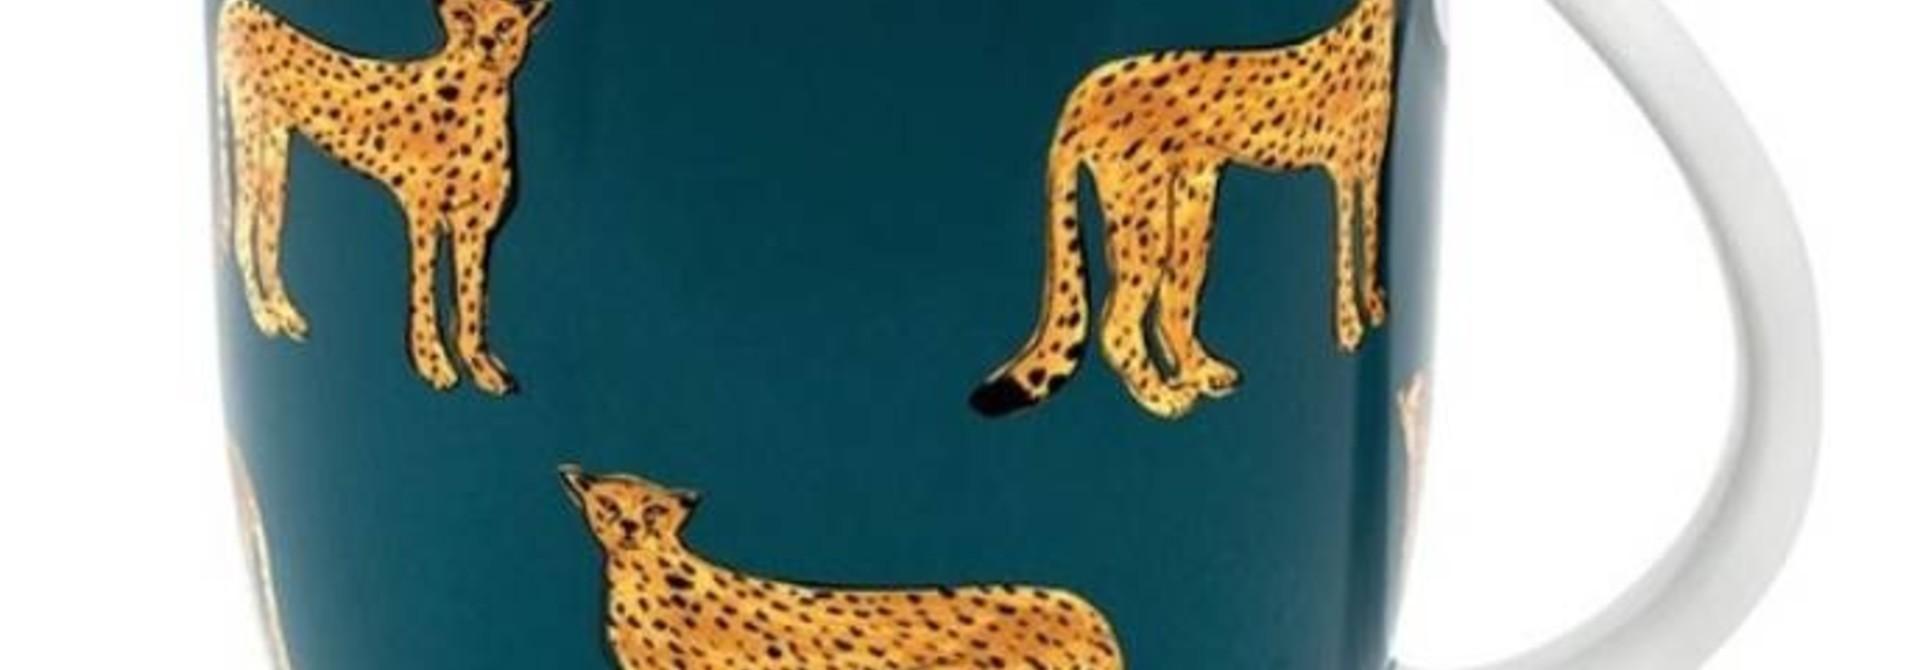 Fabienne Chapot Mug Large Cheetah